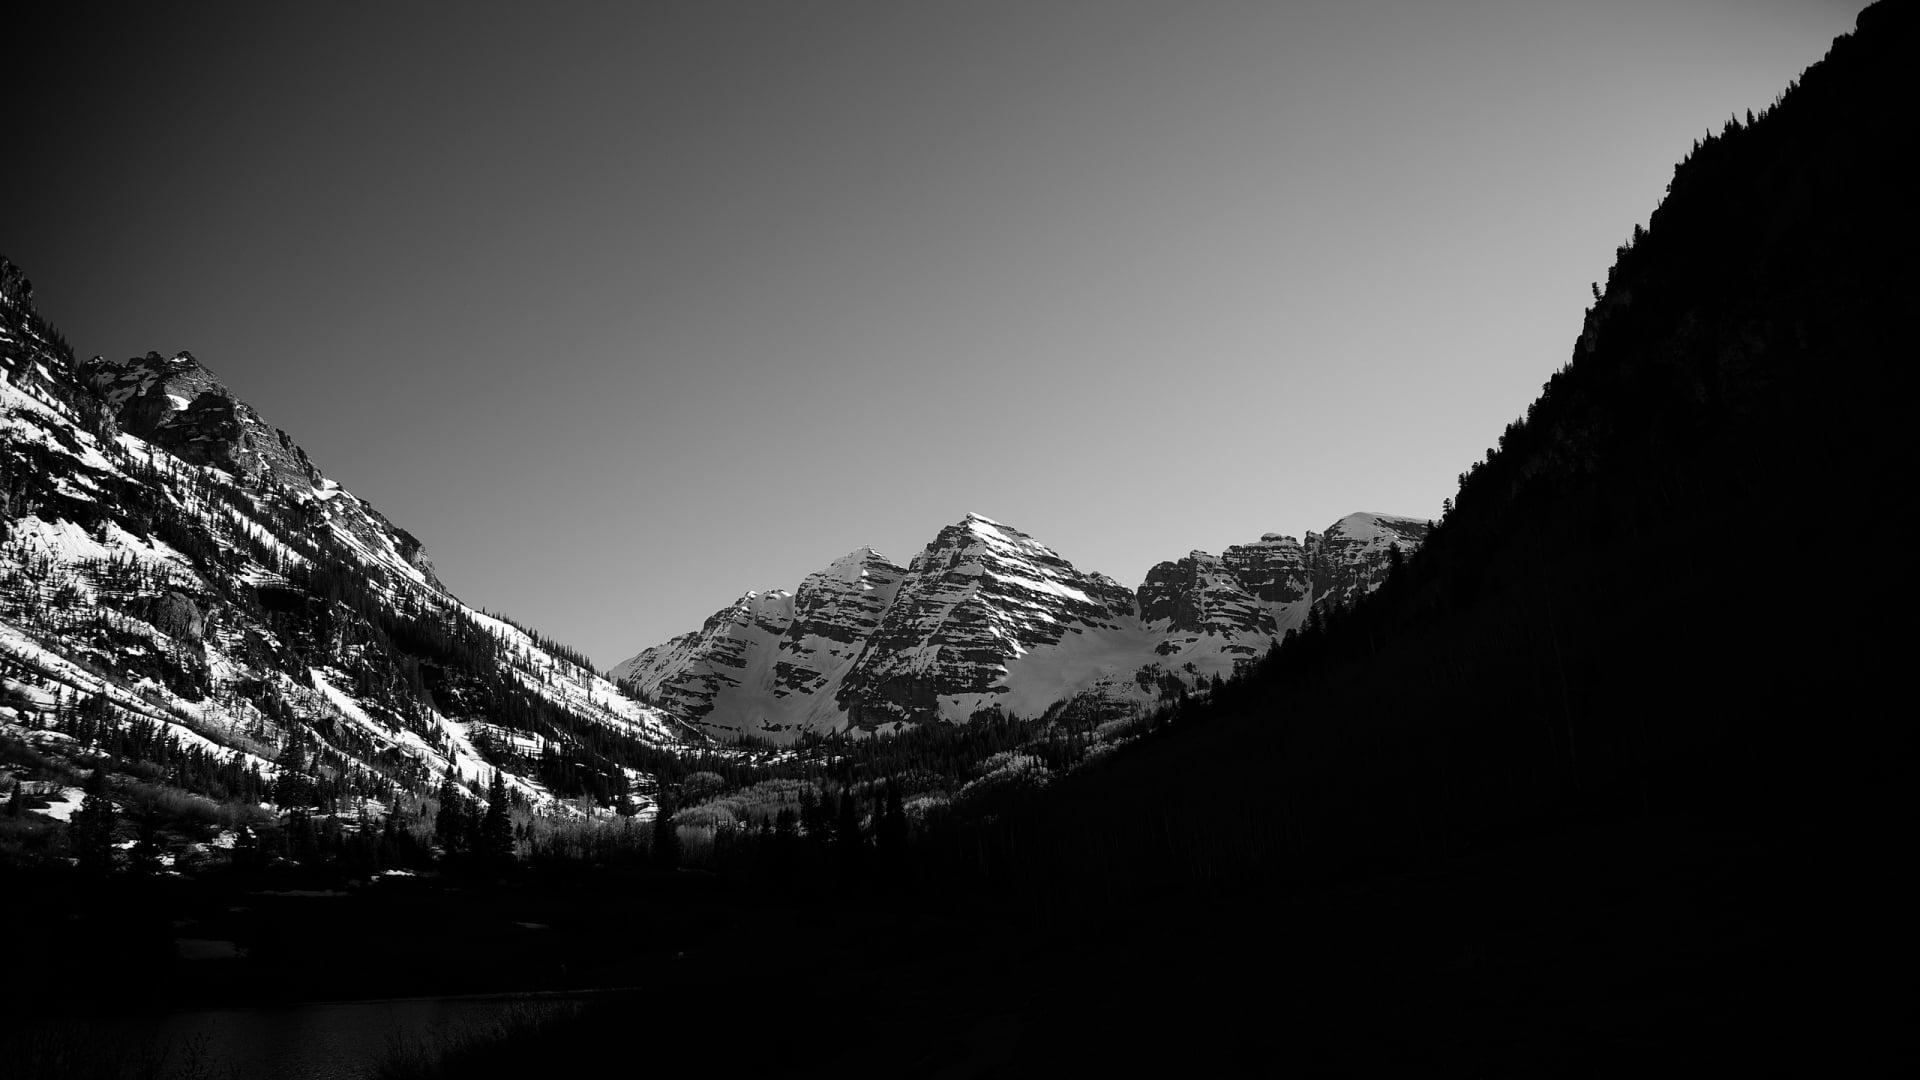 Black and White Images 4K